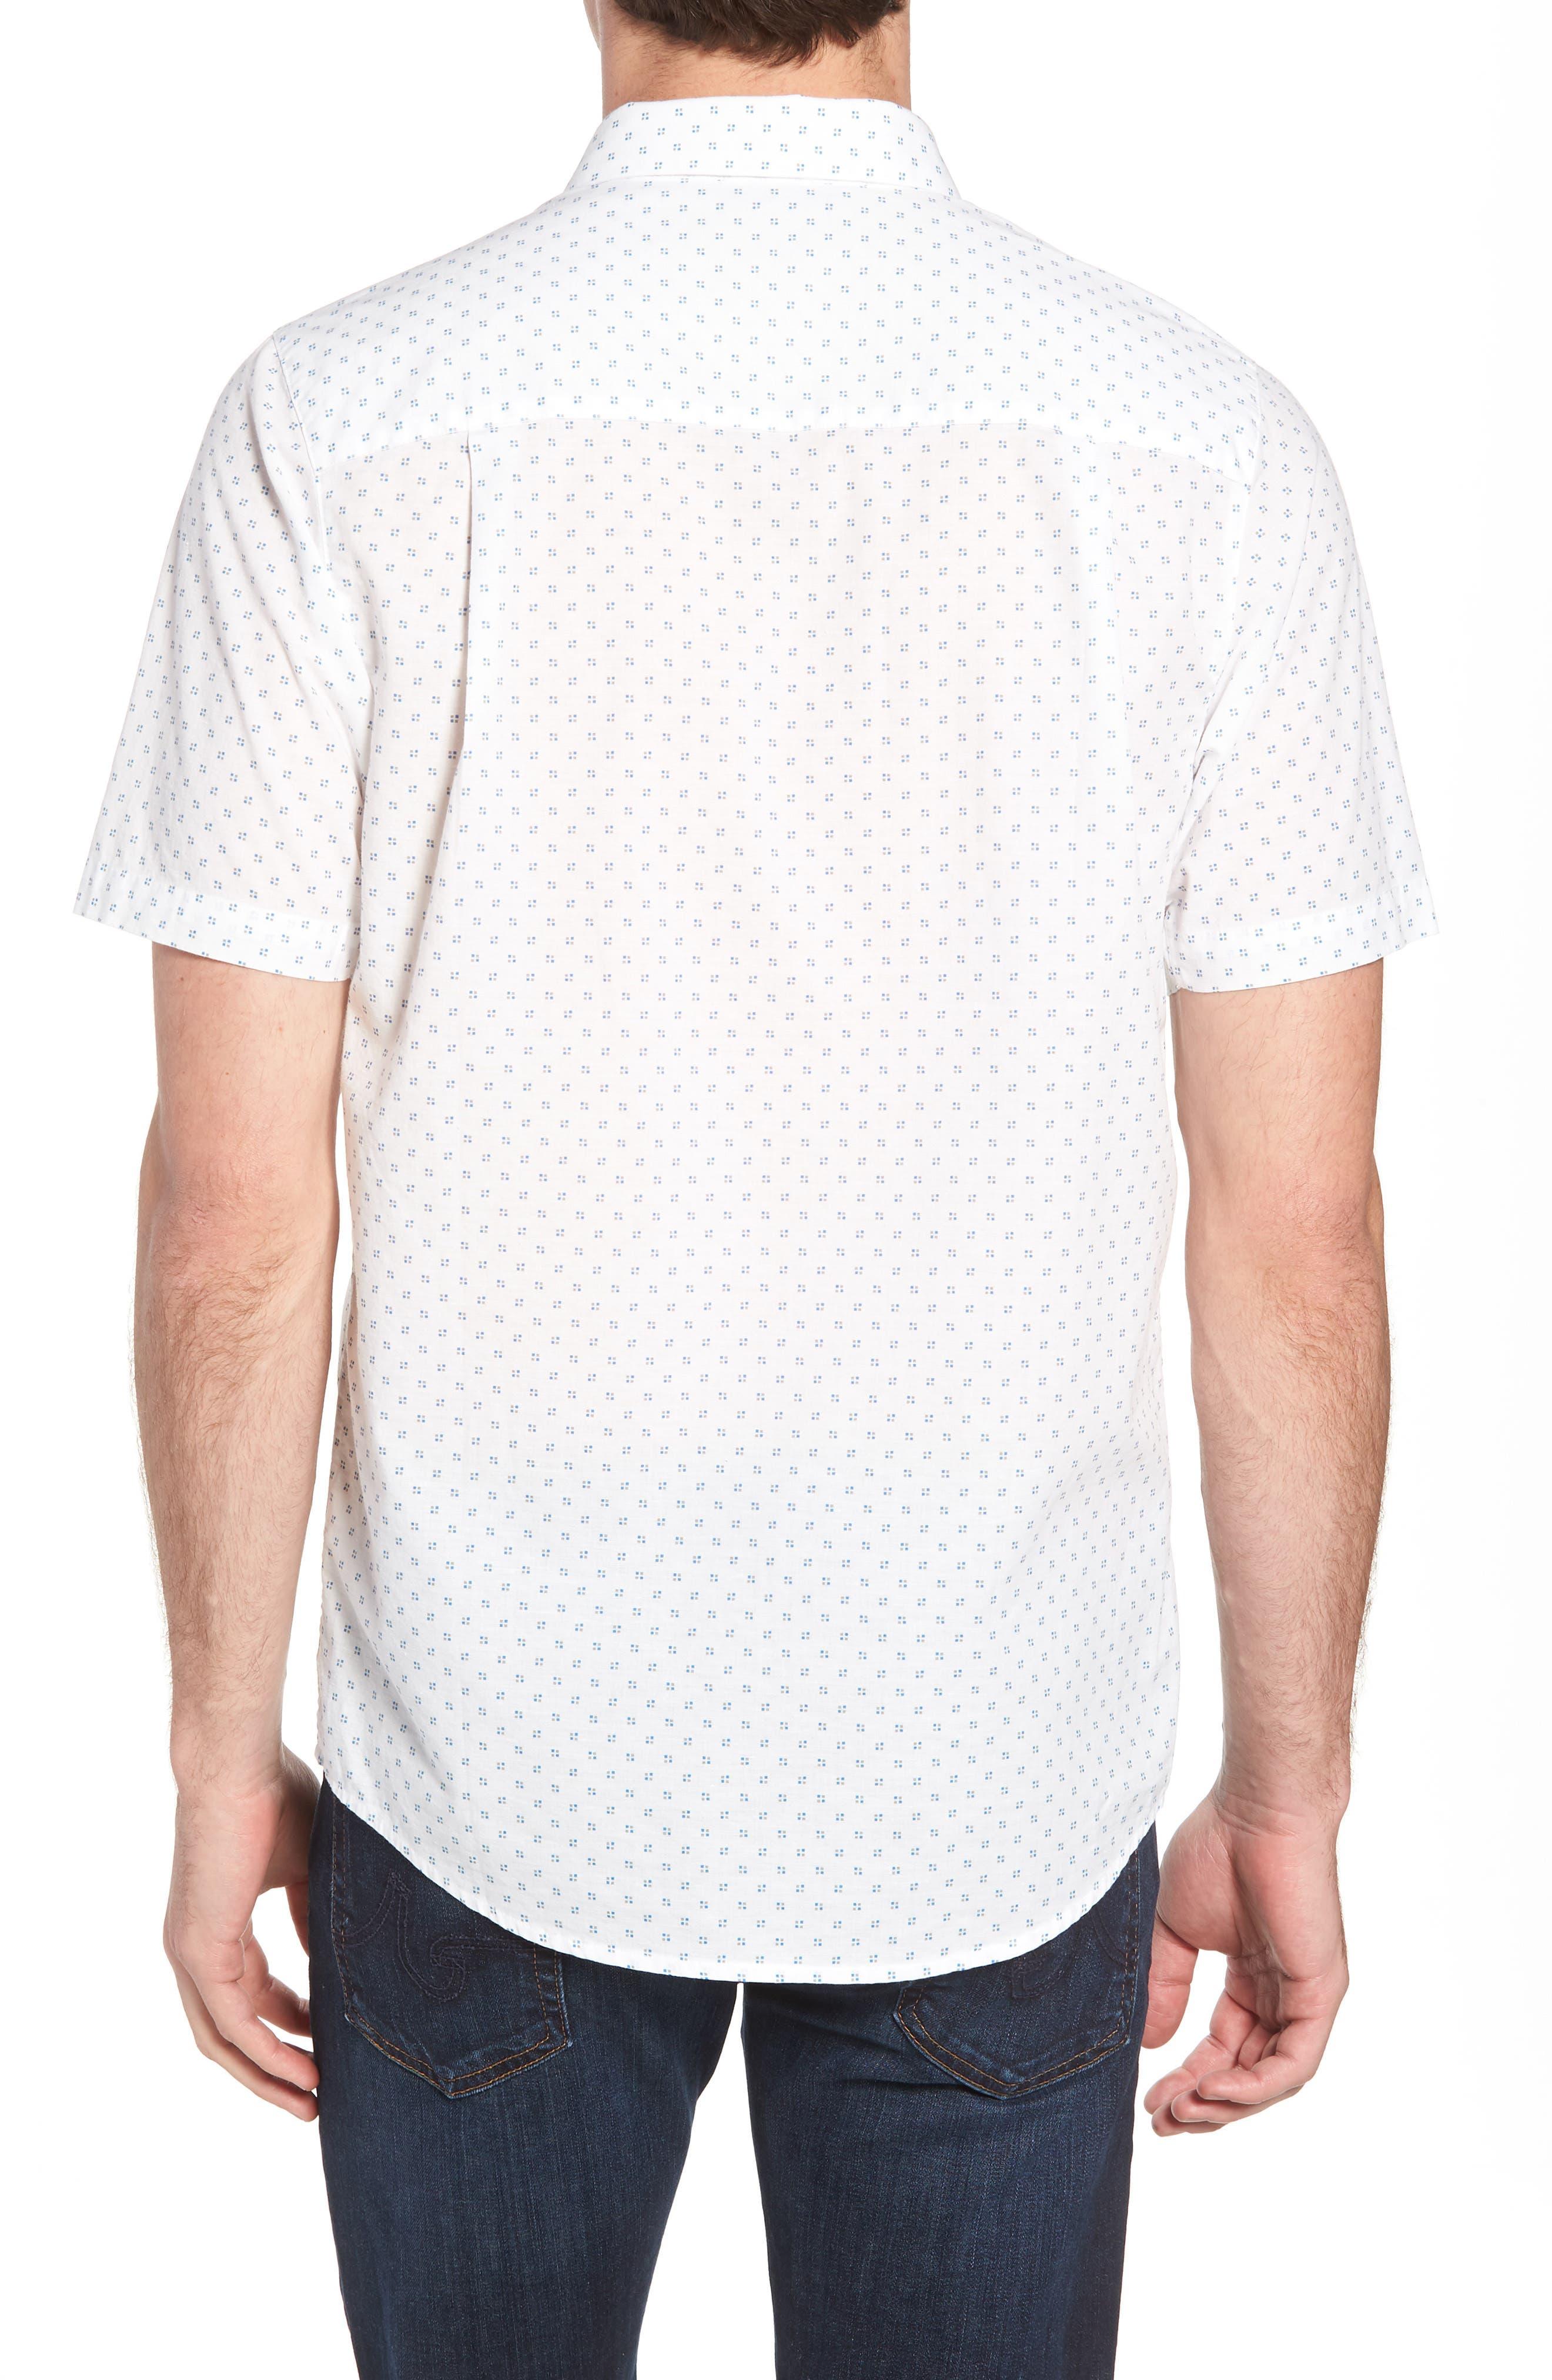 Nangs Print Sport Shirt,                             Alternate thumbnail 3, color,                             White